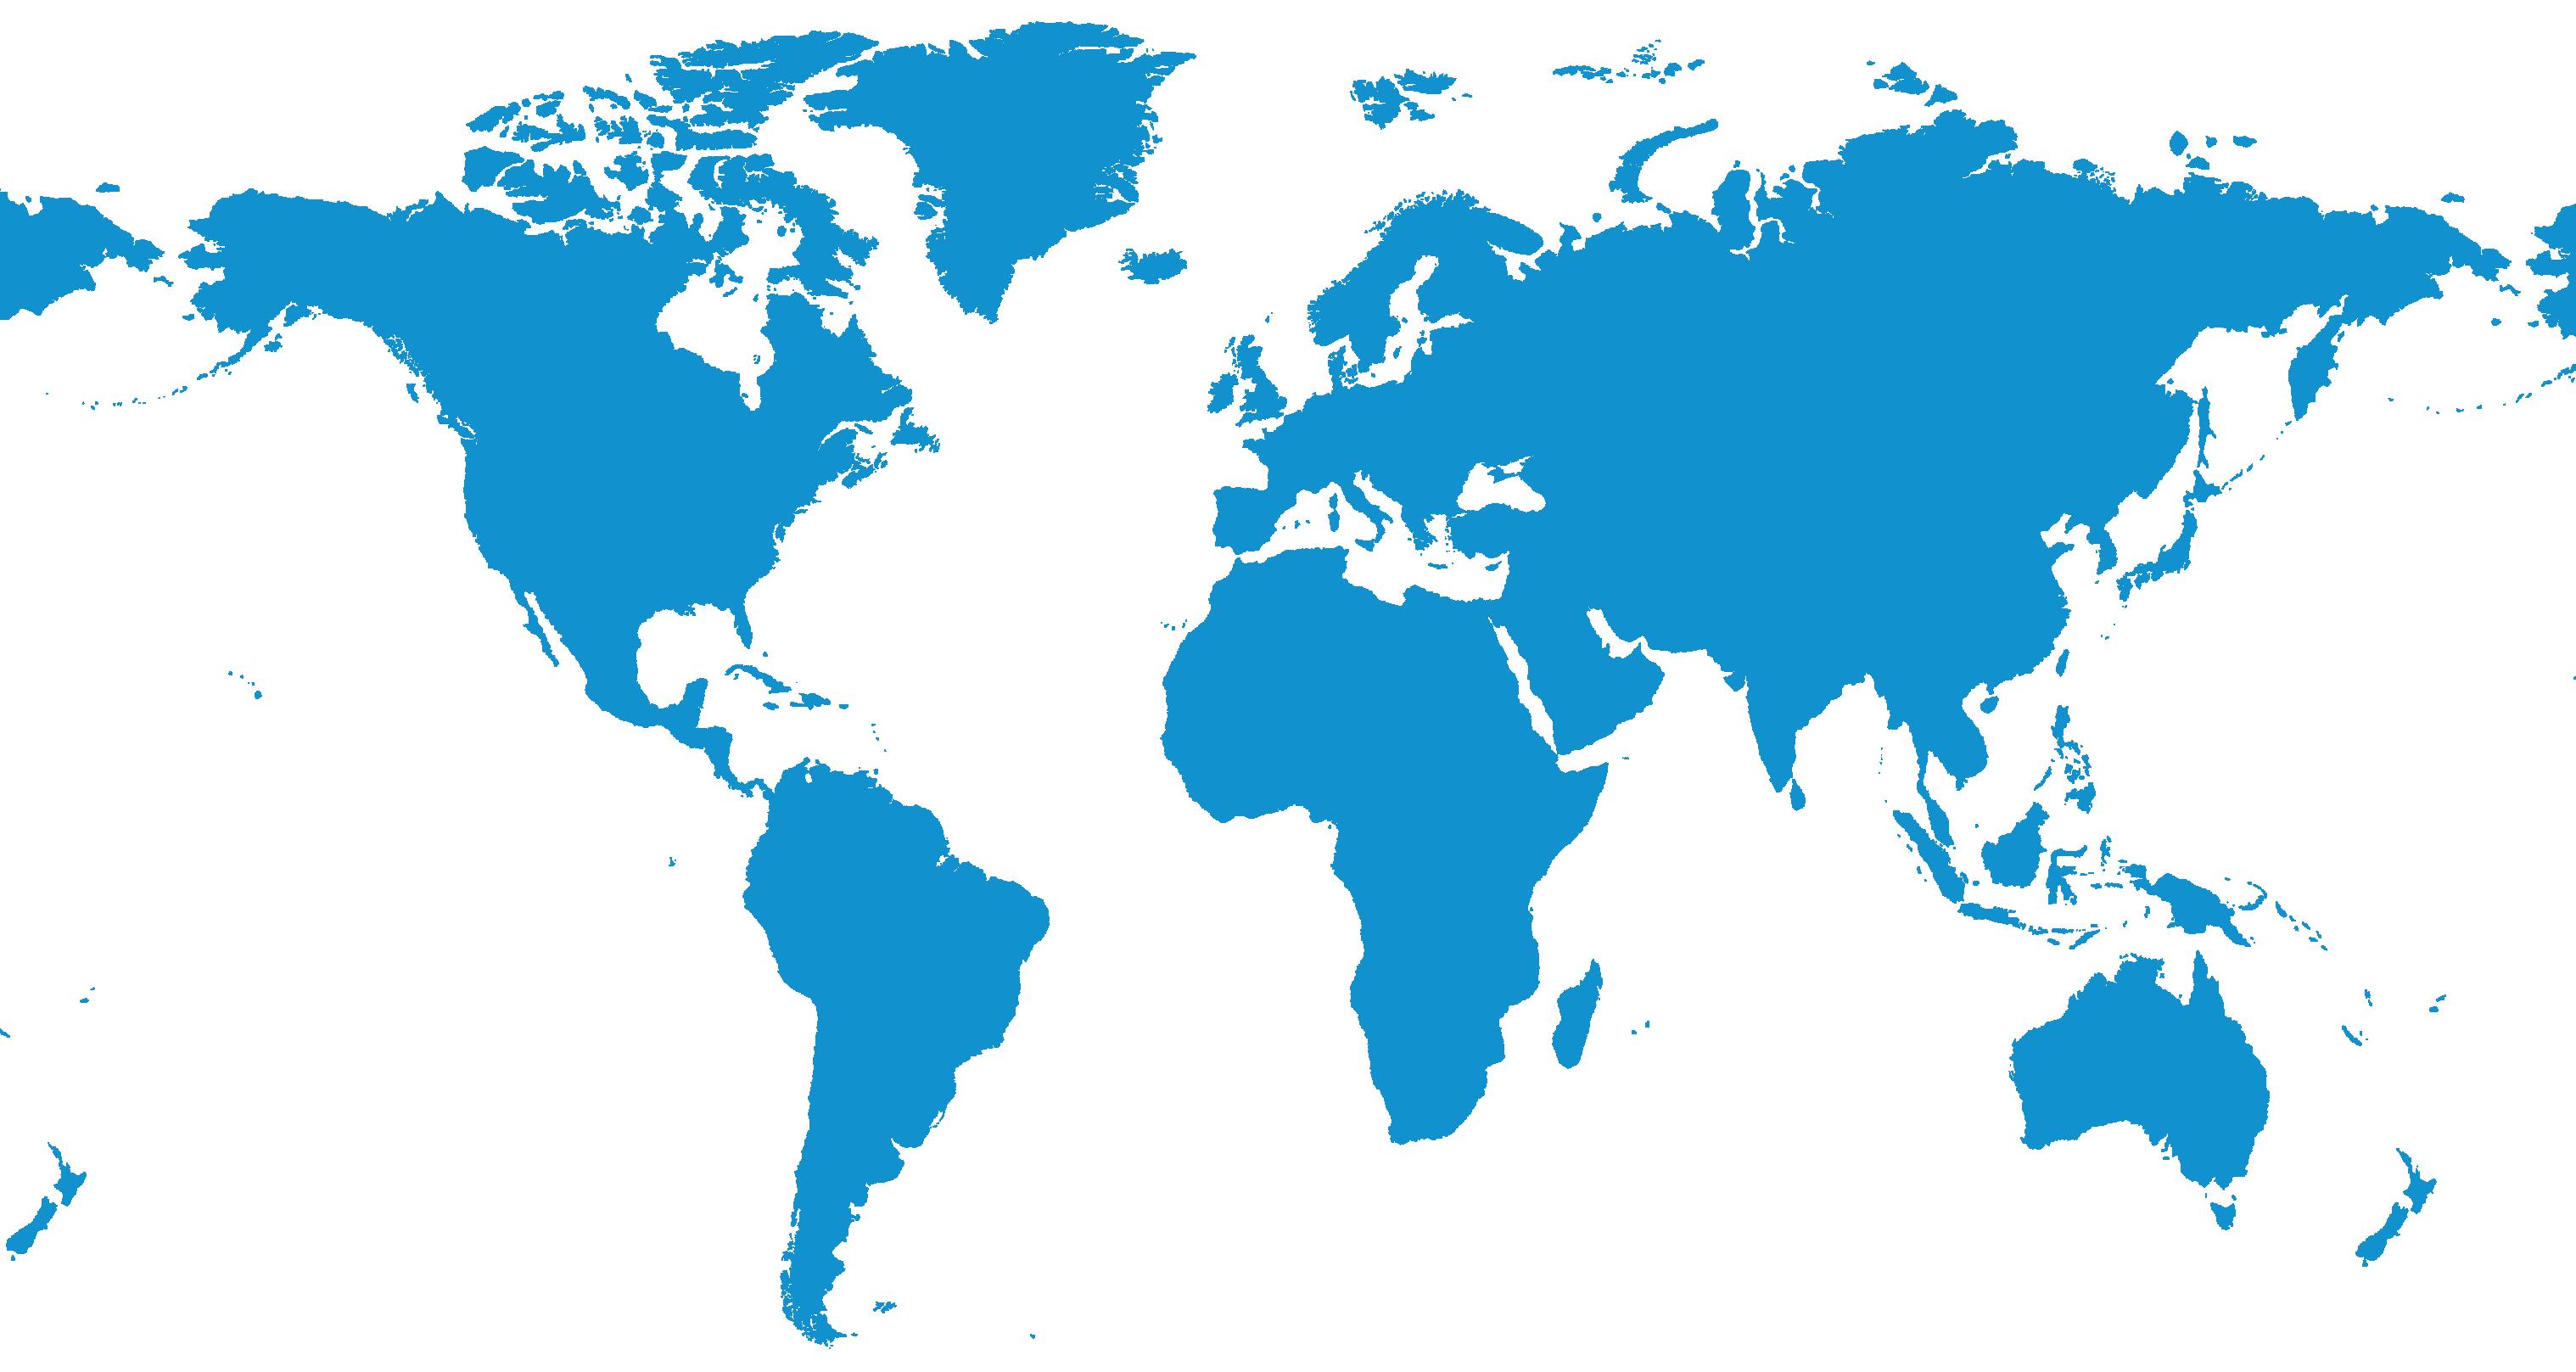 World map vector png. Illustrator changyuheng me